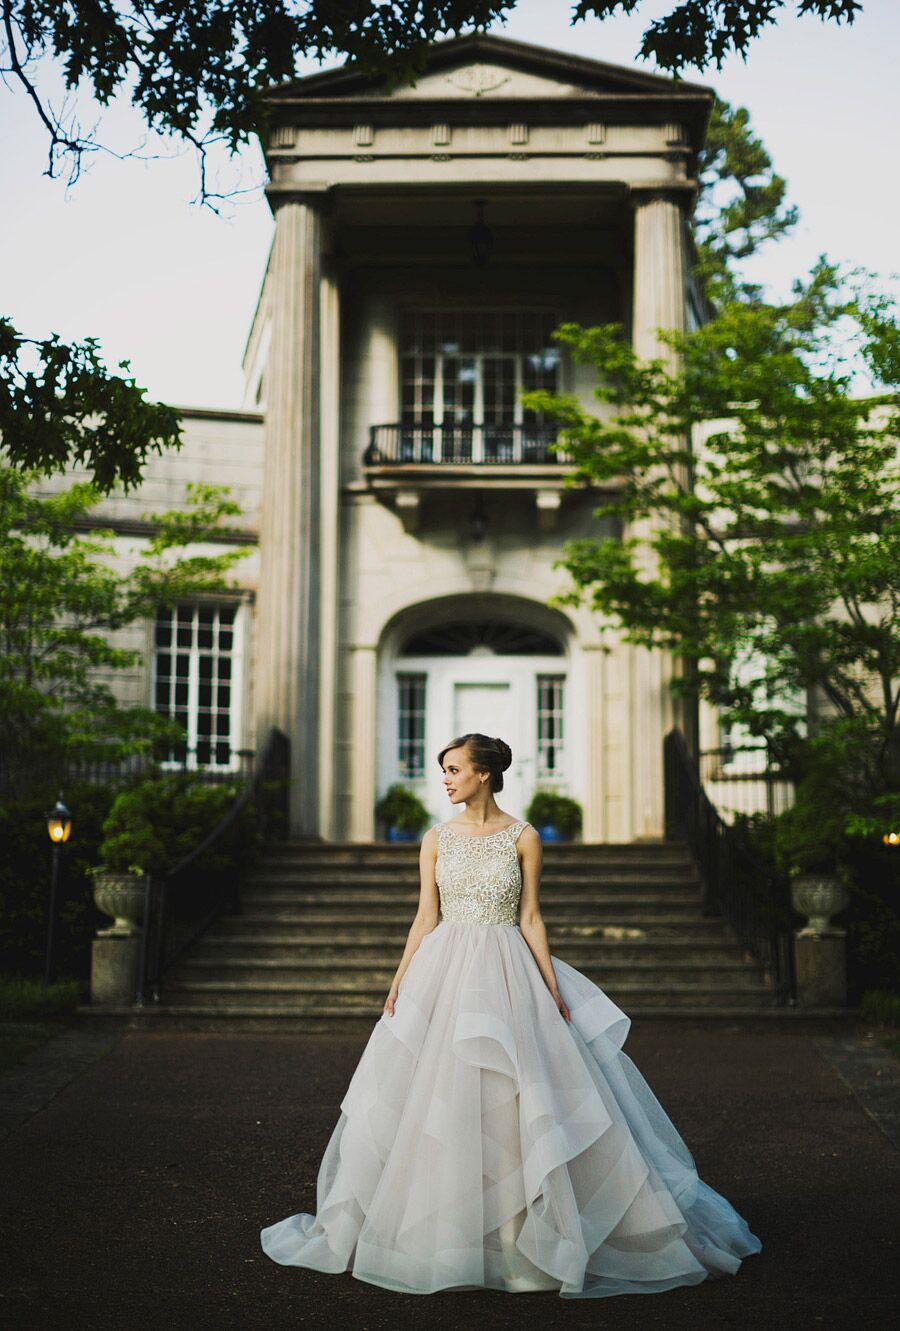 Bridal Salons in Huntsville, AL - The Knot